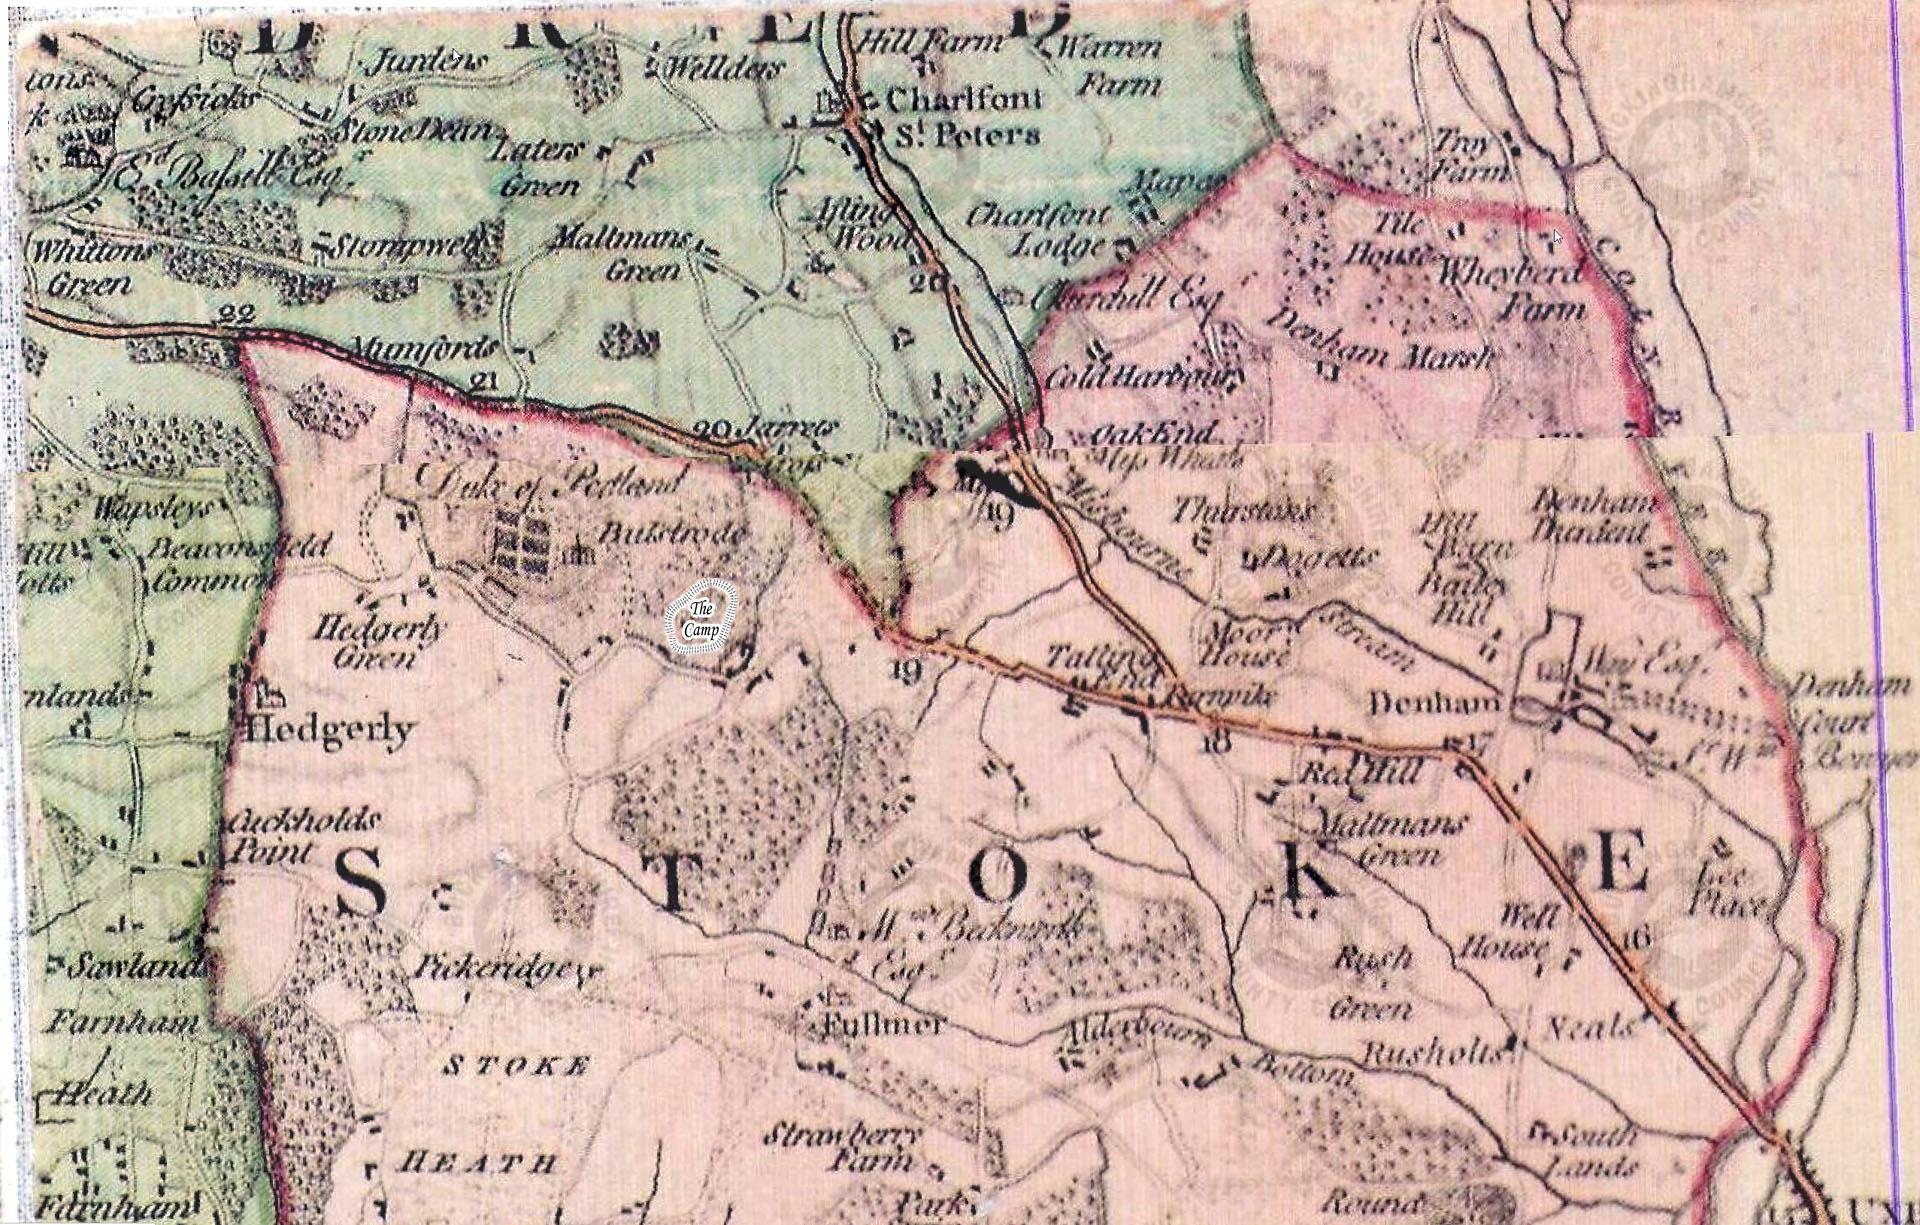 Jeffreys 1760 Map